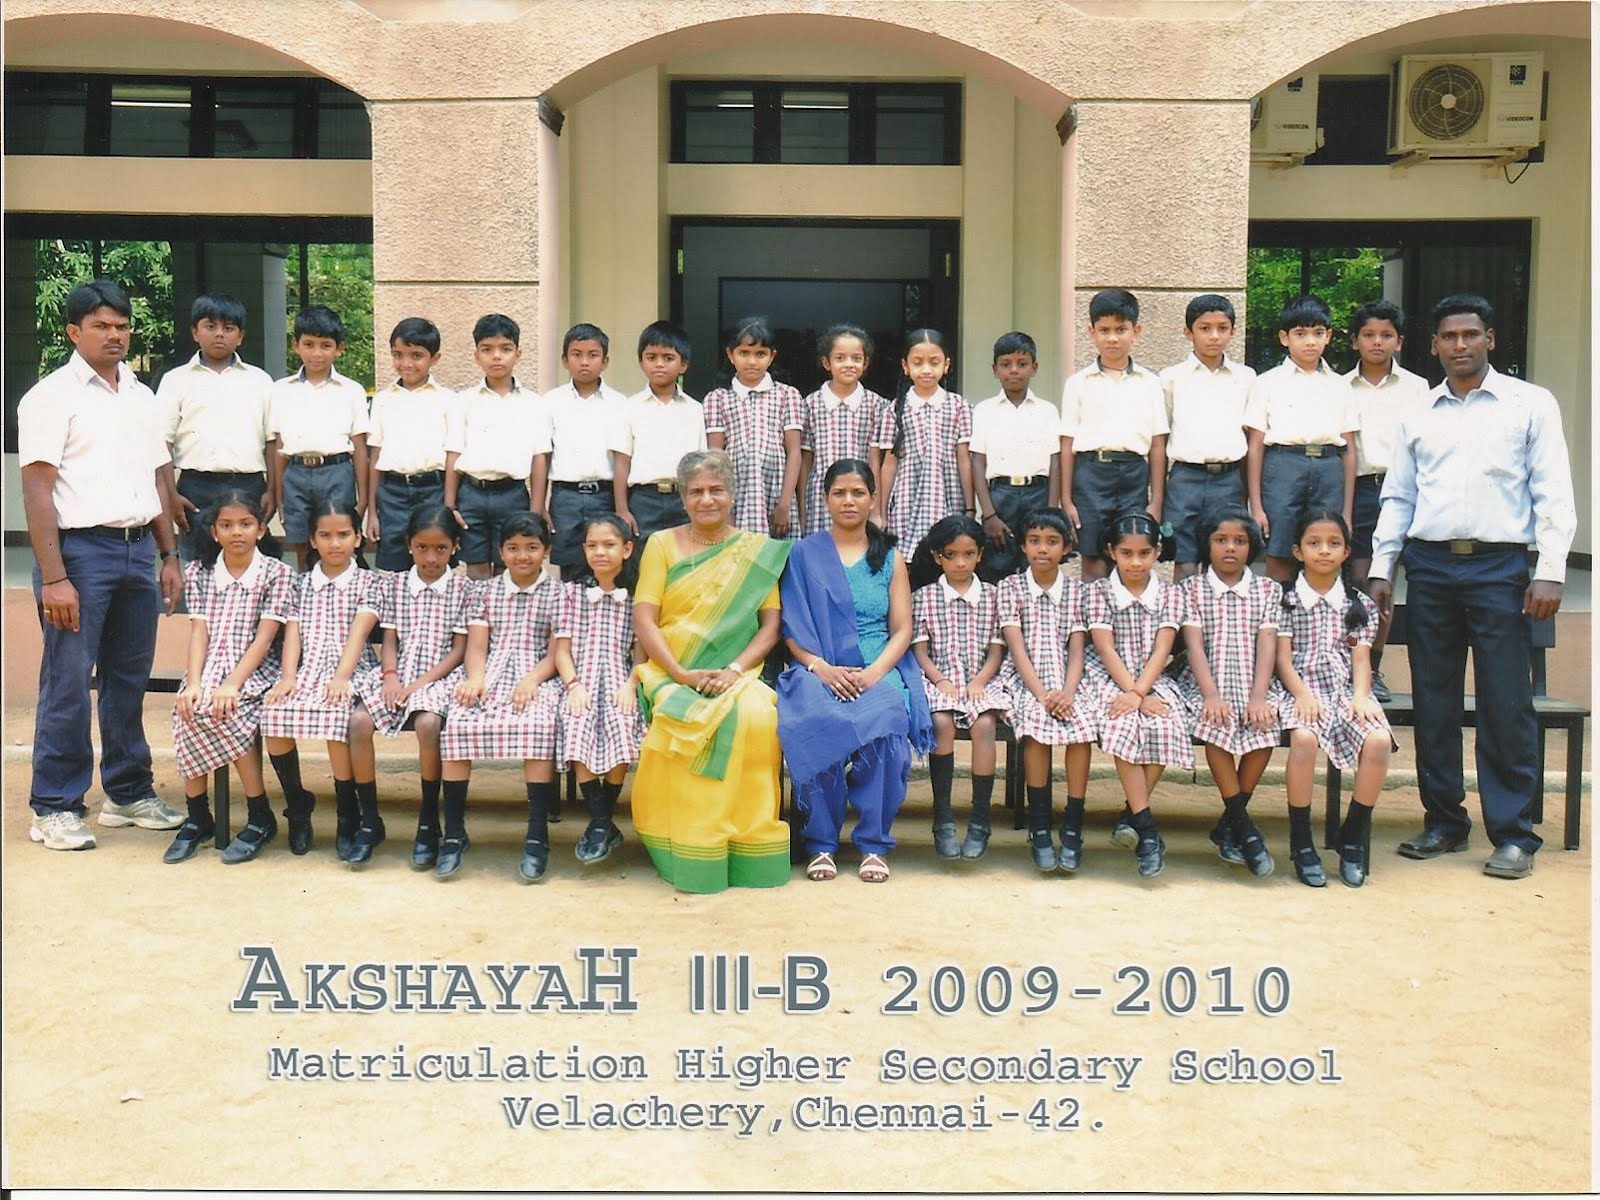 Welcome to AkshayaH Global School